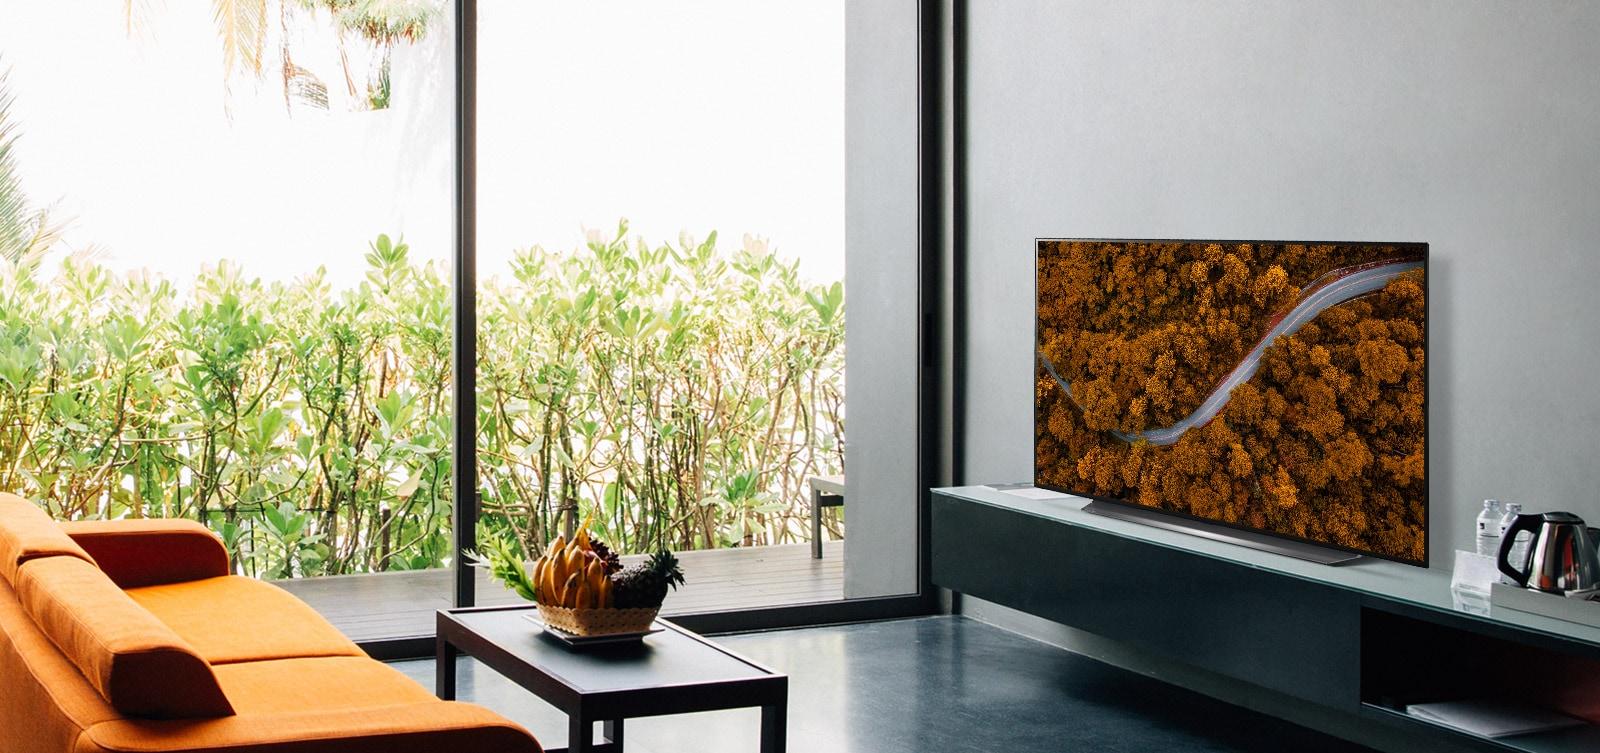 Dnevna soba sa sjedećom garniturom i televizorom na kojem je prikazan pogled na prirodu iz visine